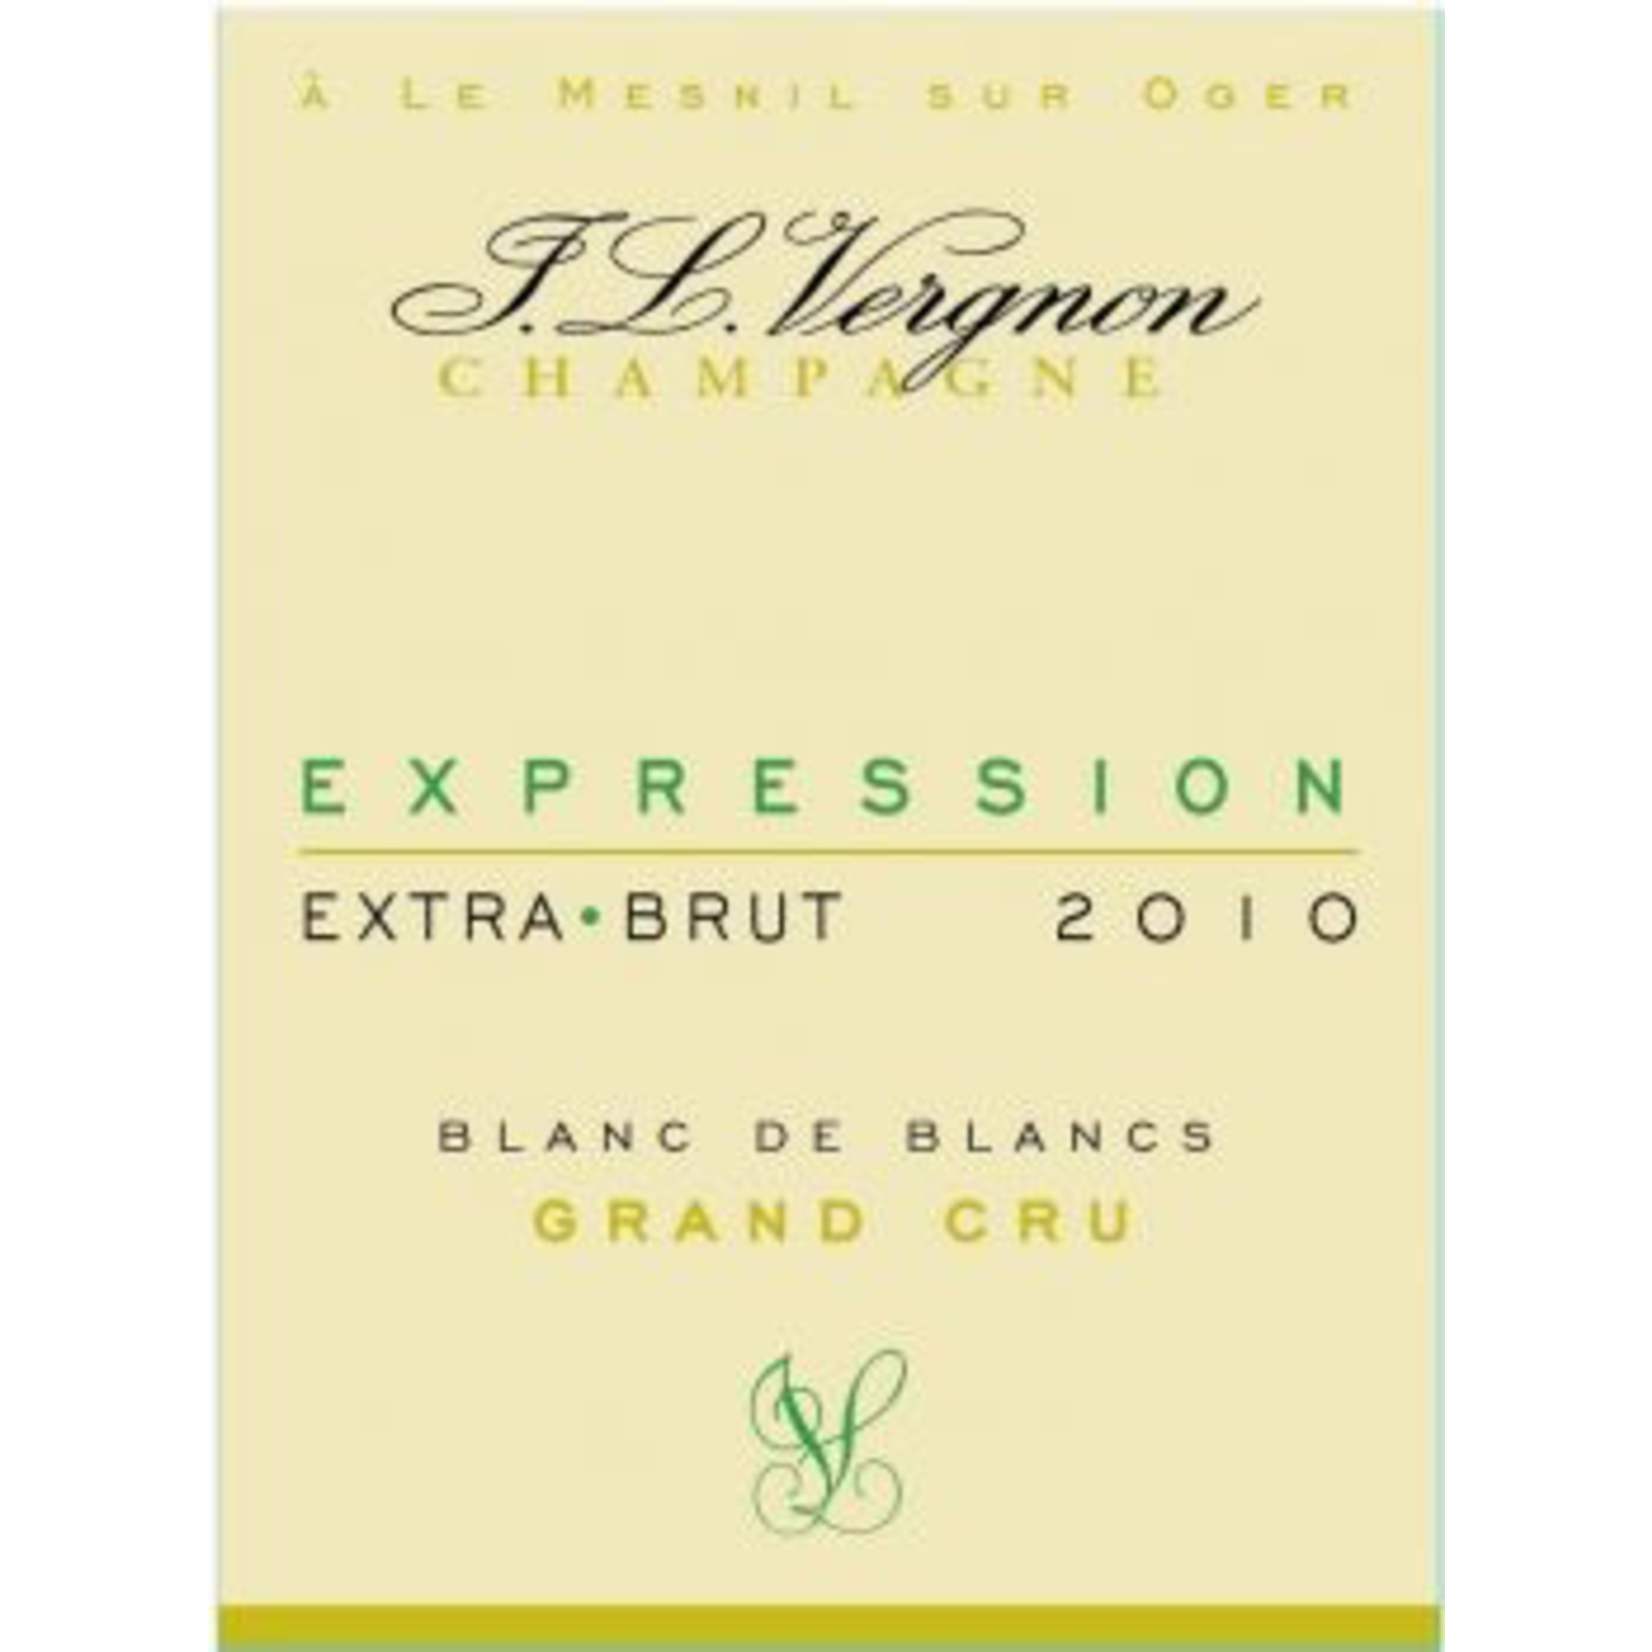 J L Vergnon Champagne Grand Cru Blanc de Blancs Extra Brut Expression 2010